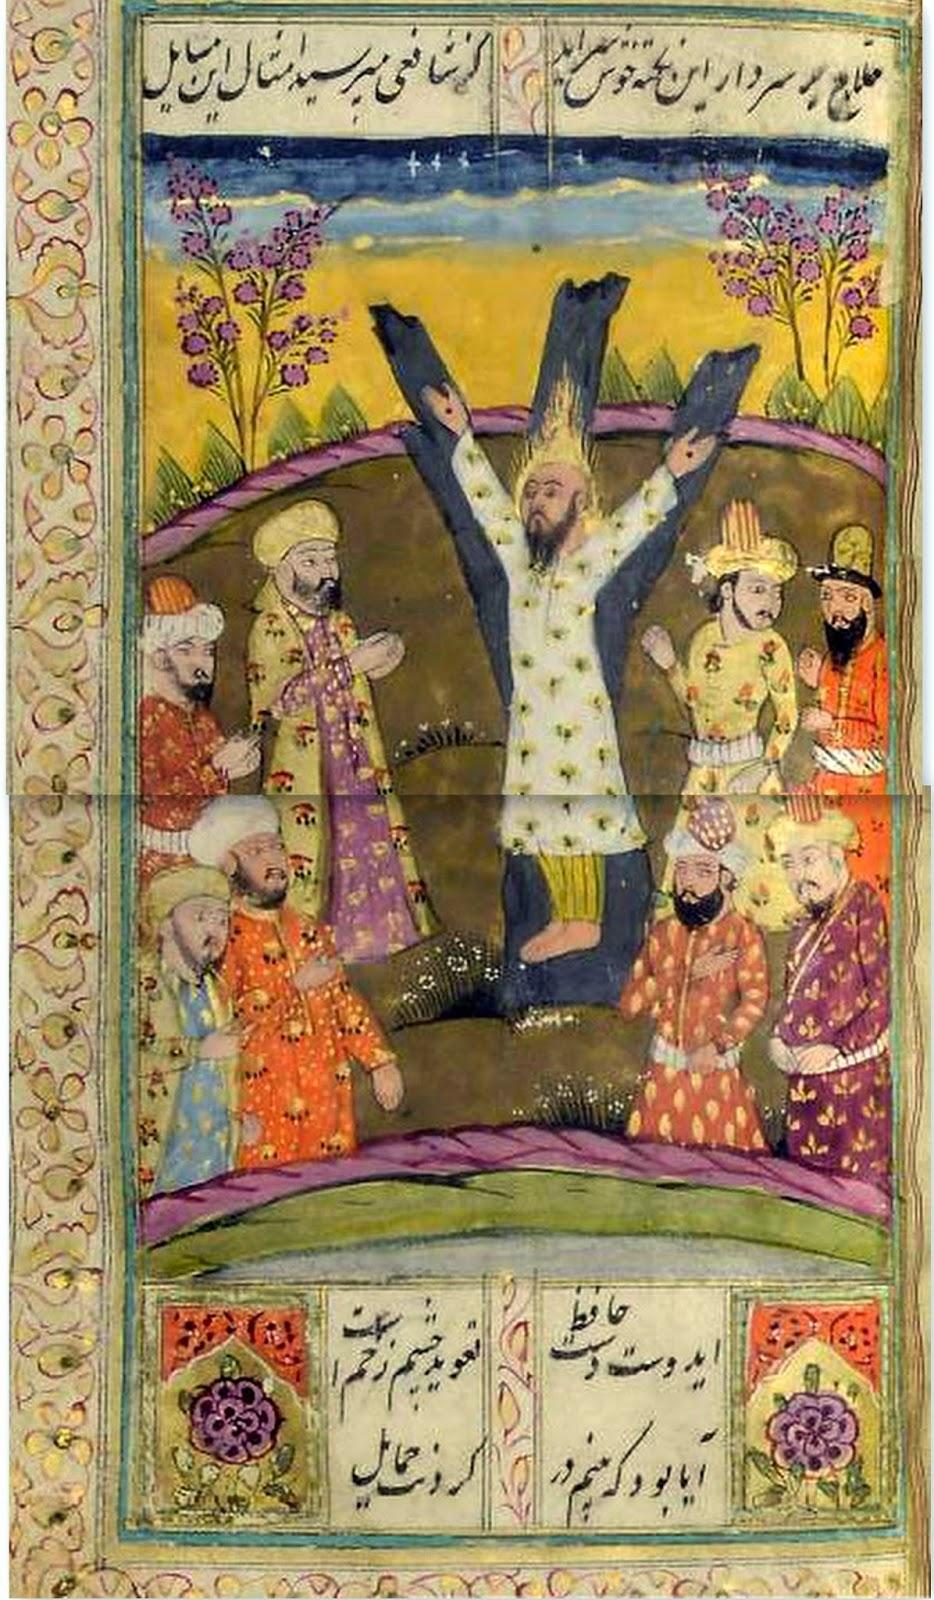 Mansur+al-jallaj+Kashmiri+manuscript+19t